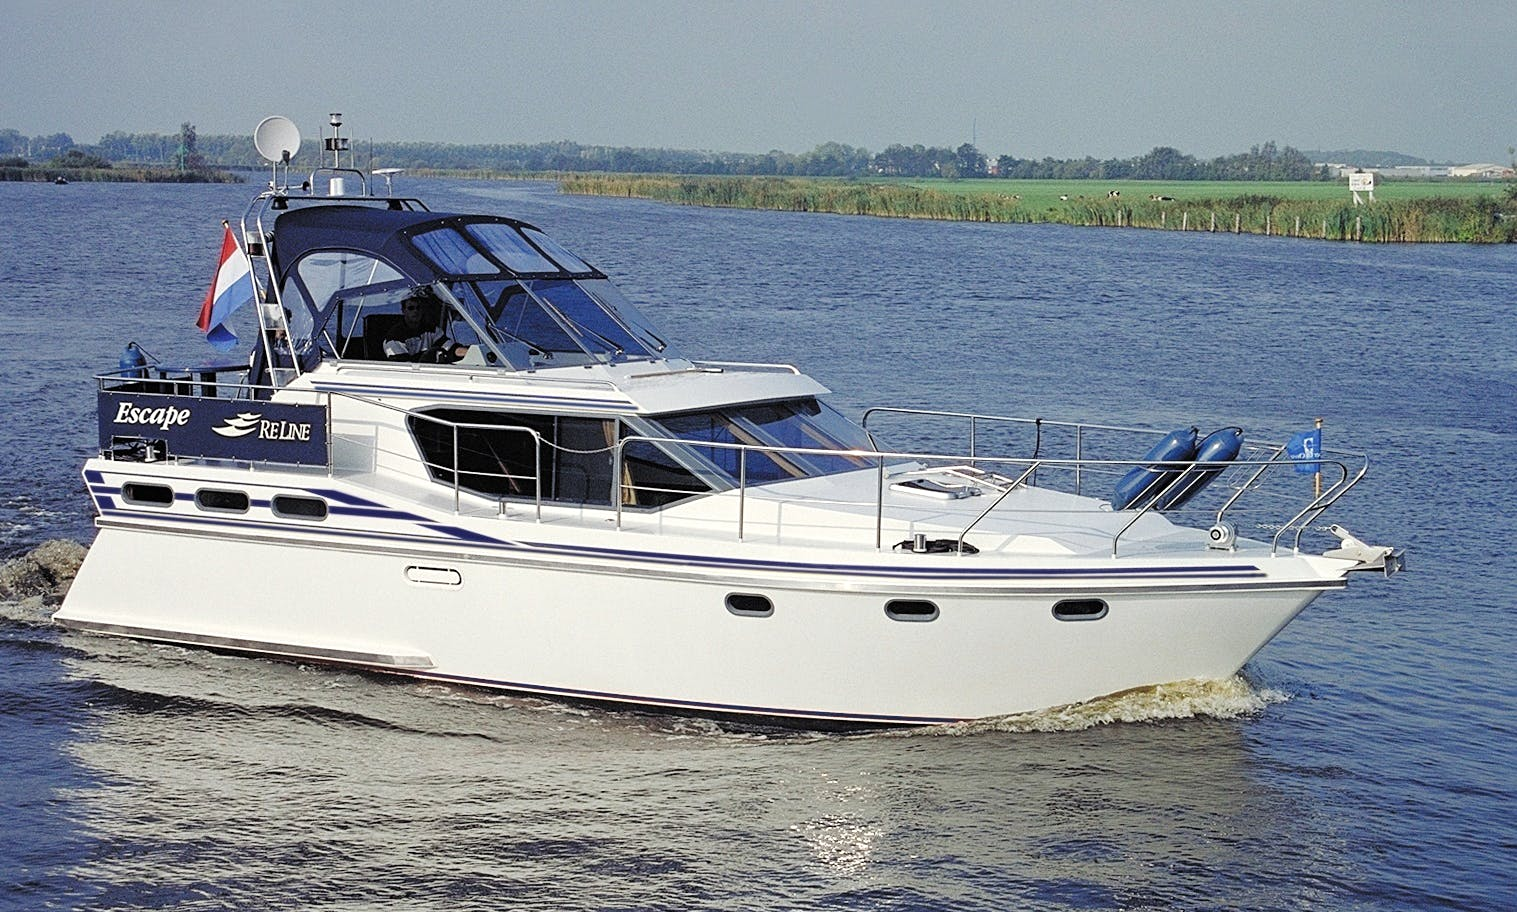 38' Reline 1150 Motor Yacht Rental in Drachten - Friesland, Netherlands